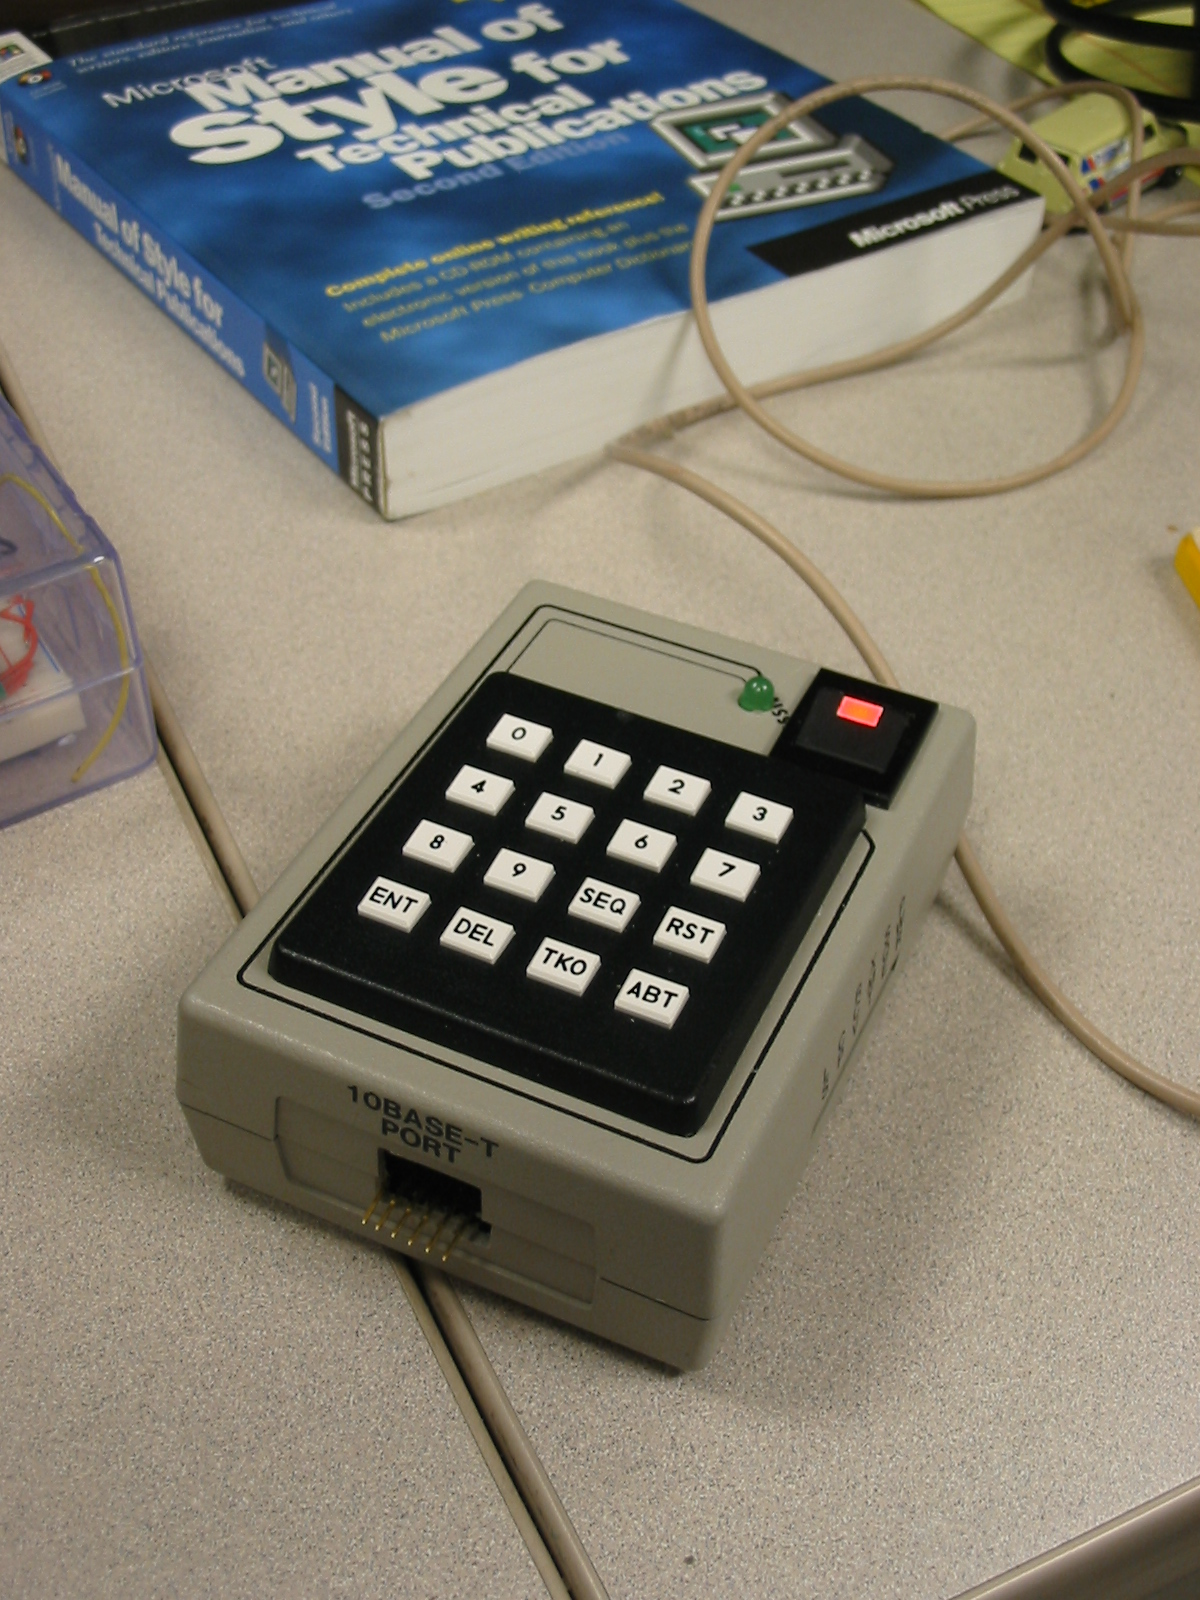 Dtmf Phone Dialer Rj9 Connector Wiring Diagram